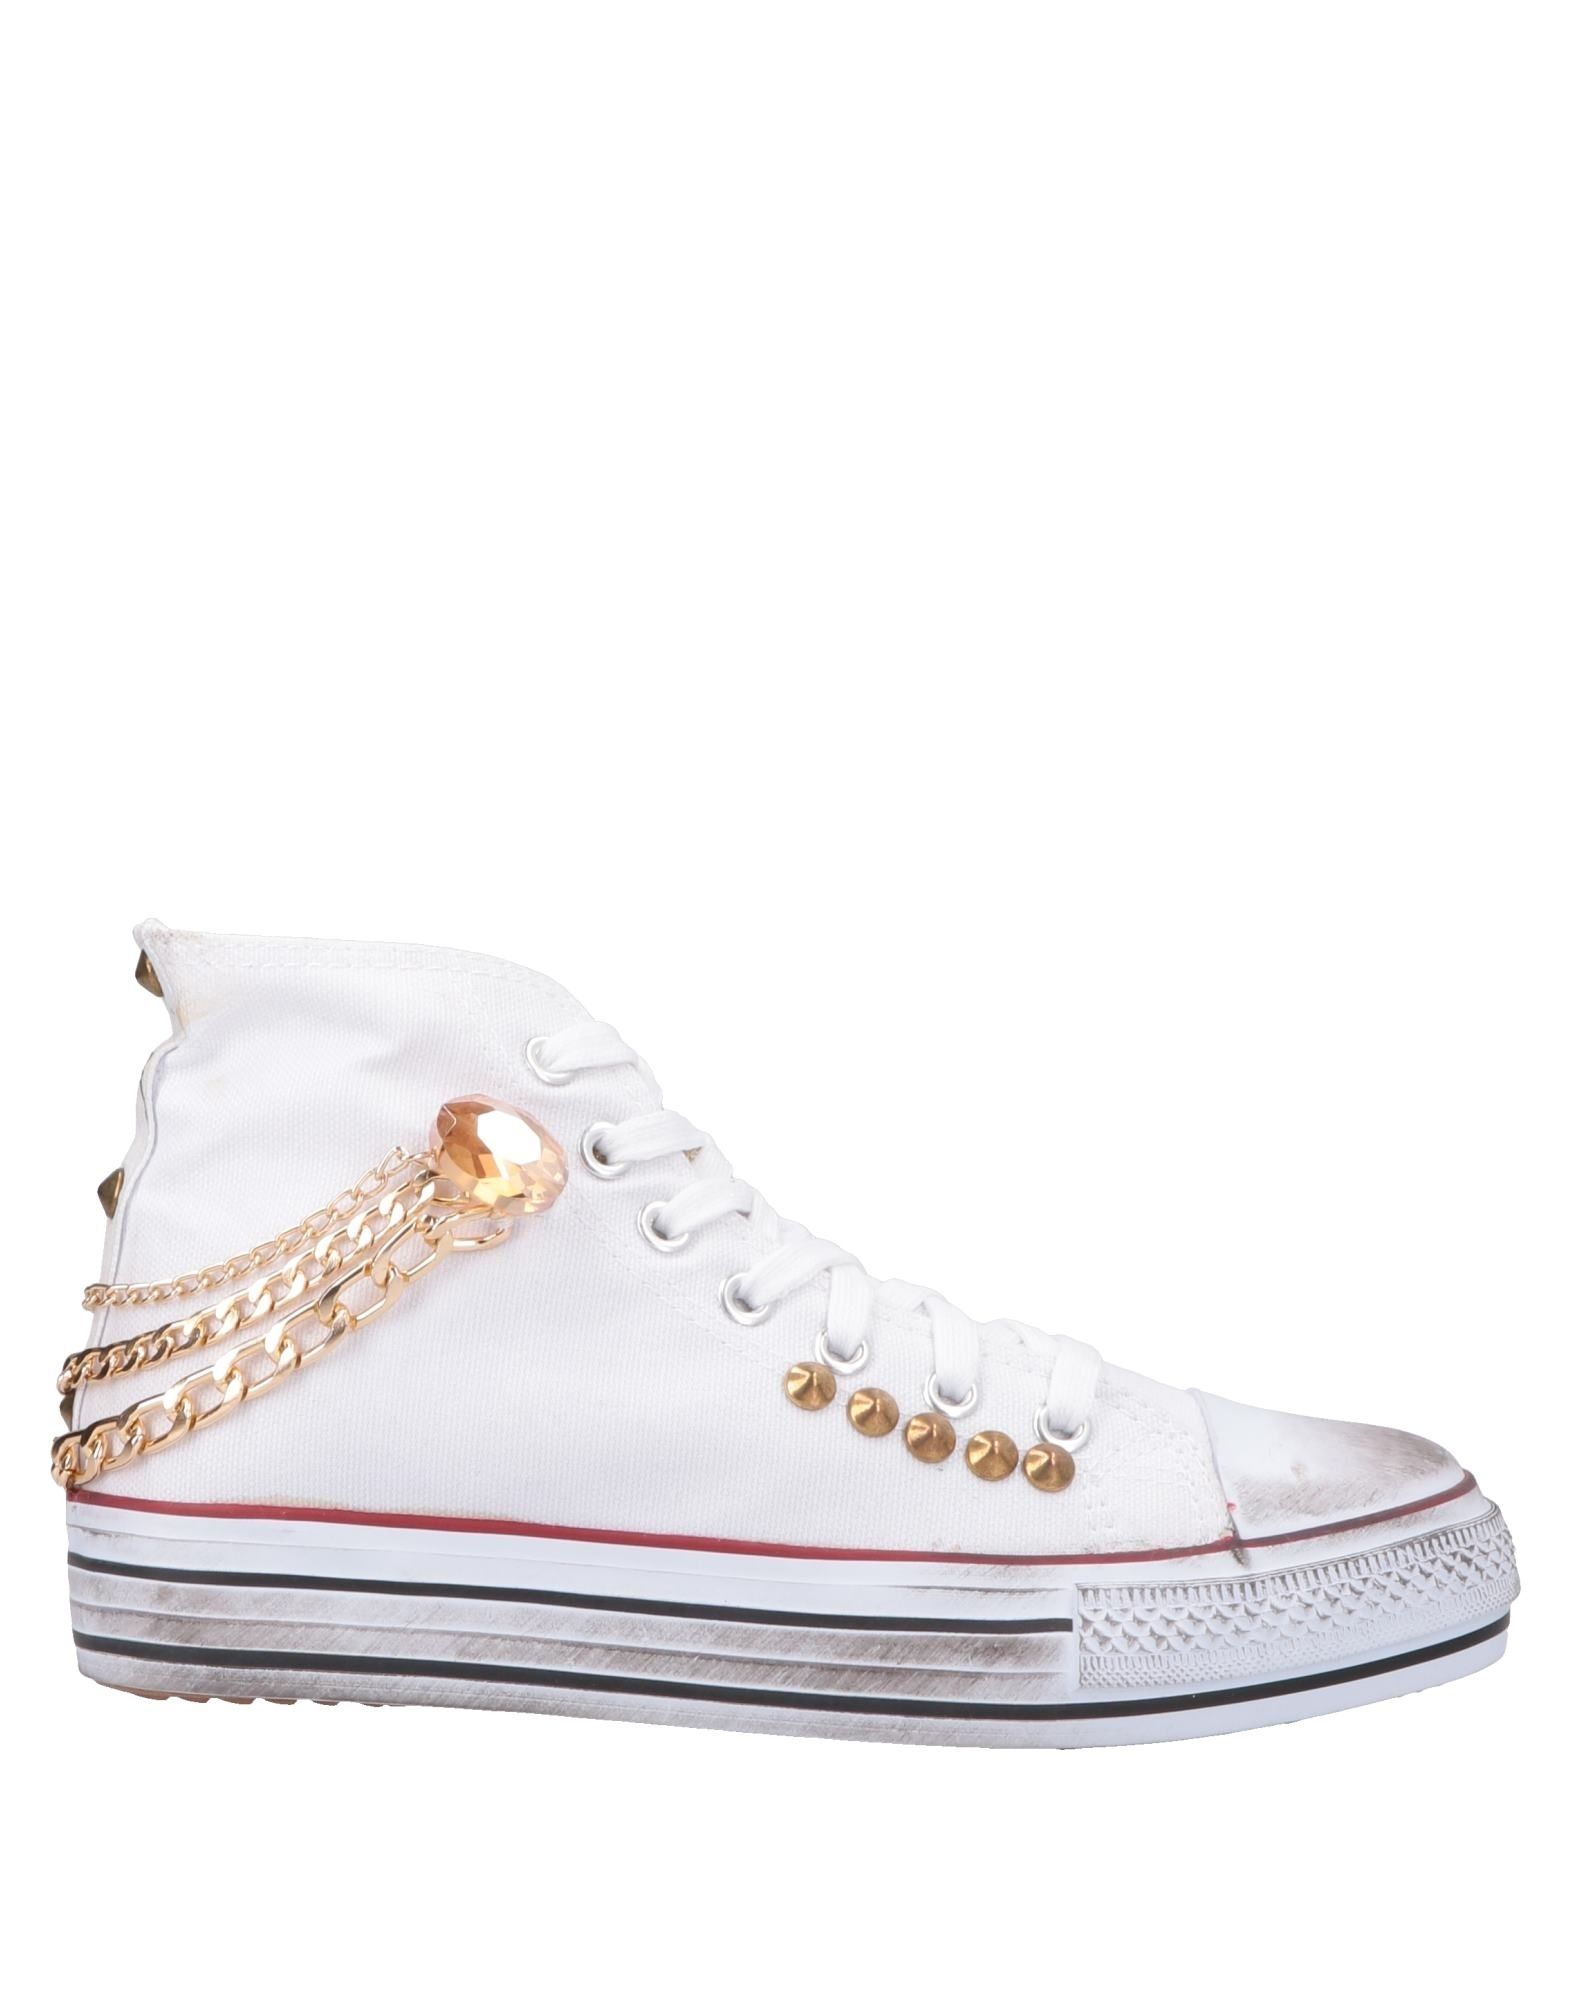 Nila Nila & Nila Nila Sneakers Damen Gutes Preis-Leistungs-Verhältnis, es lohnt sich 166455